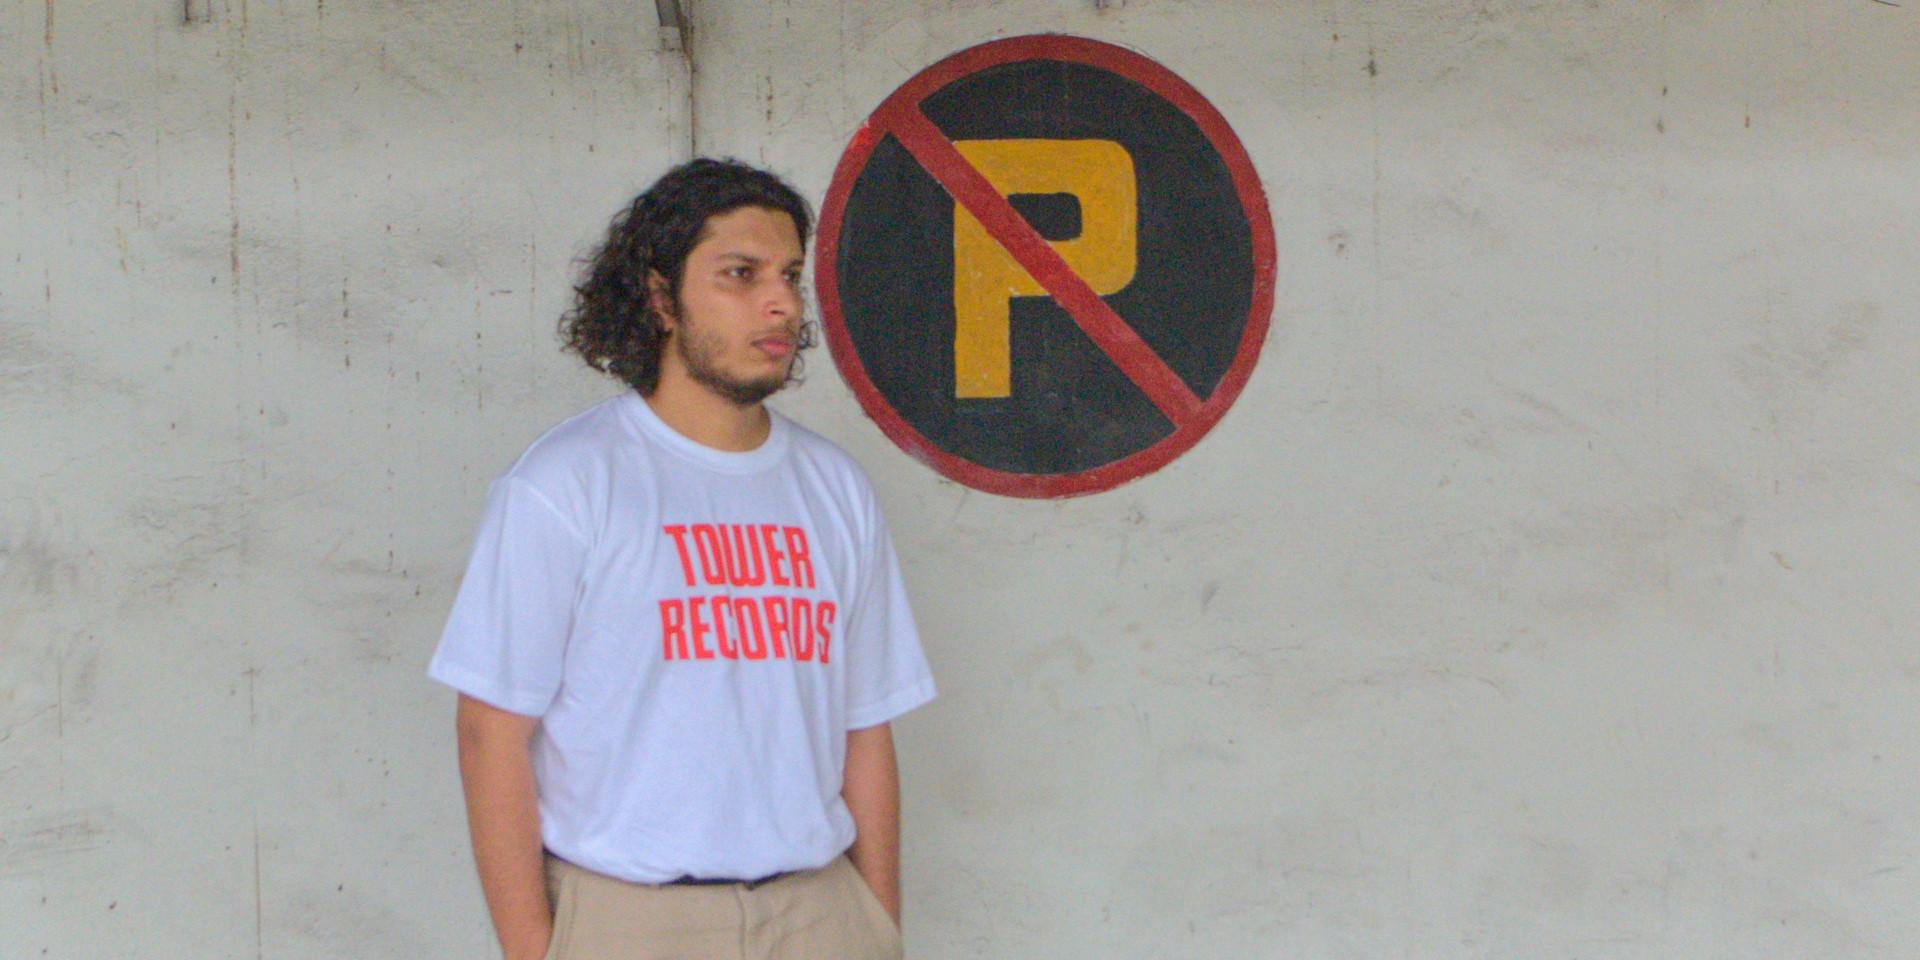 PREMIERE: chillwave/trip-hop artist Houg releases new single, 'Slice of a Pie' – listen